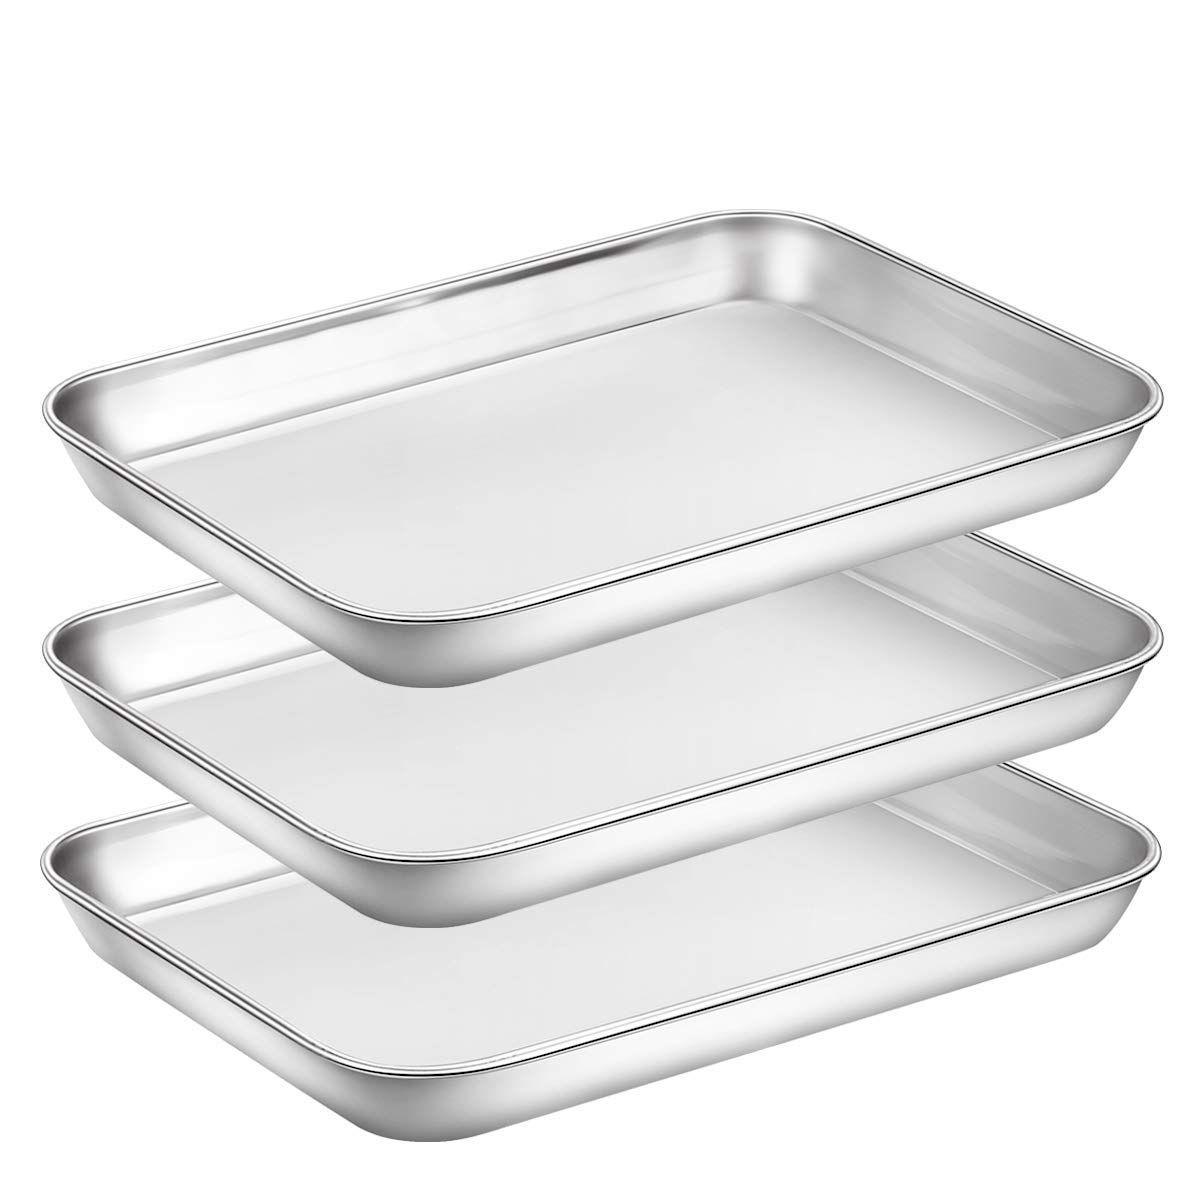 Baking sheet pan for toaster oven stainless steel baking